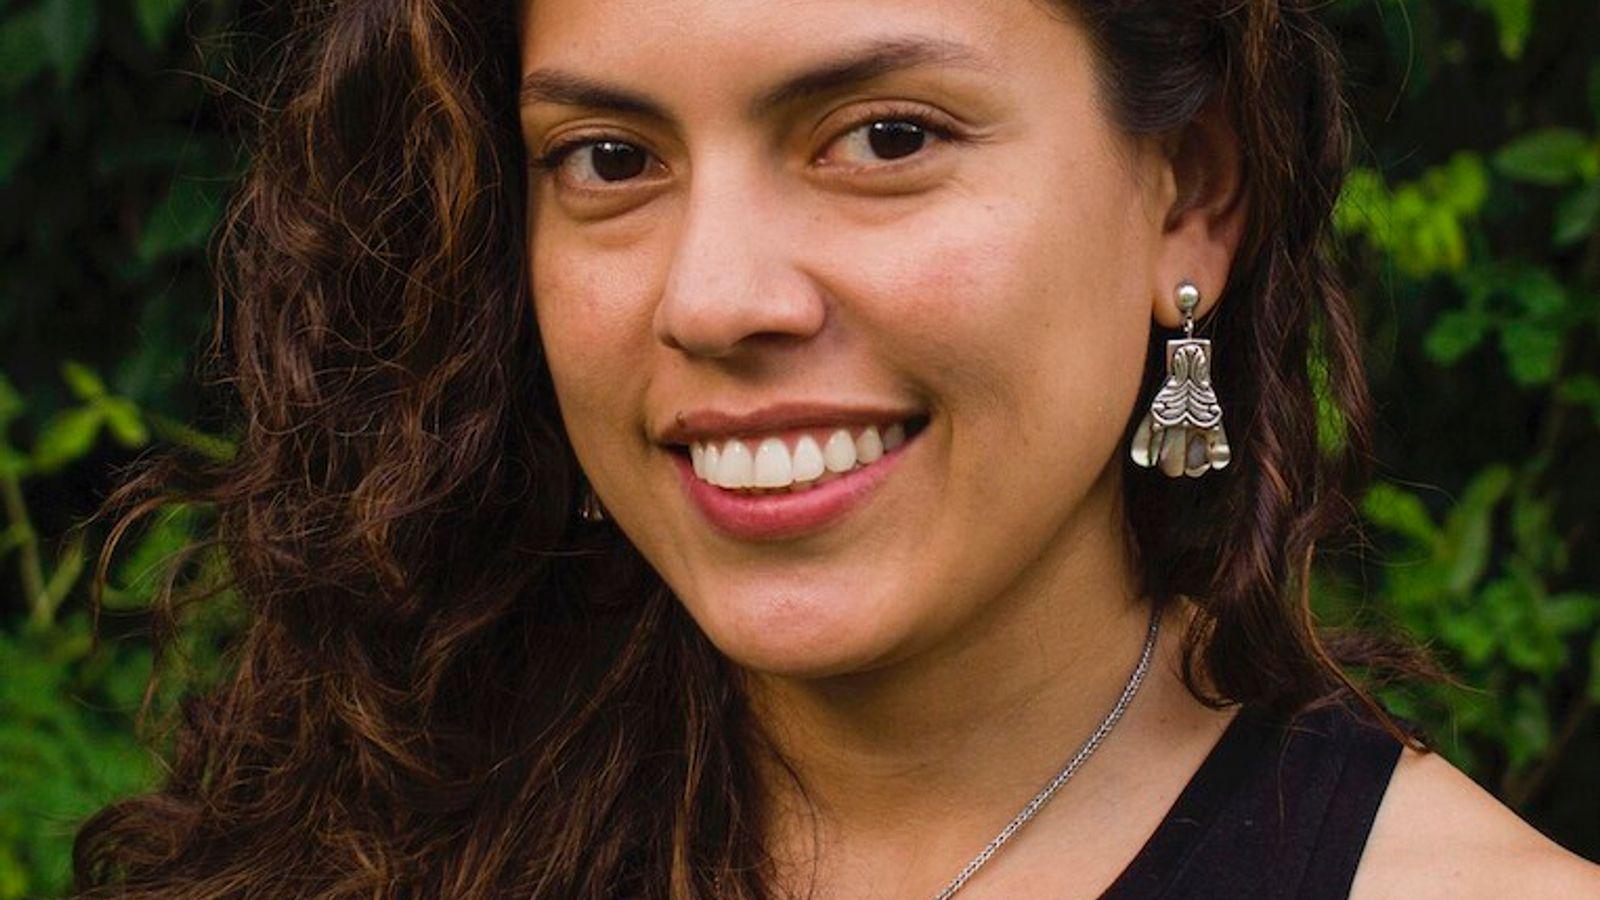 Paleontóloga peruana y exploradora de National Geographic.